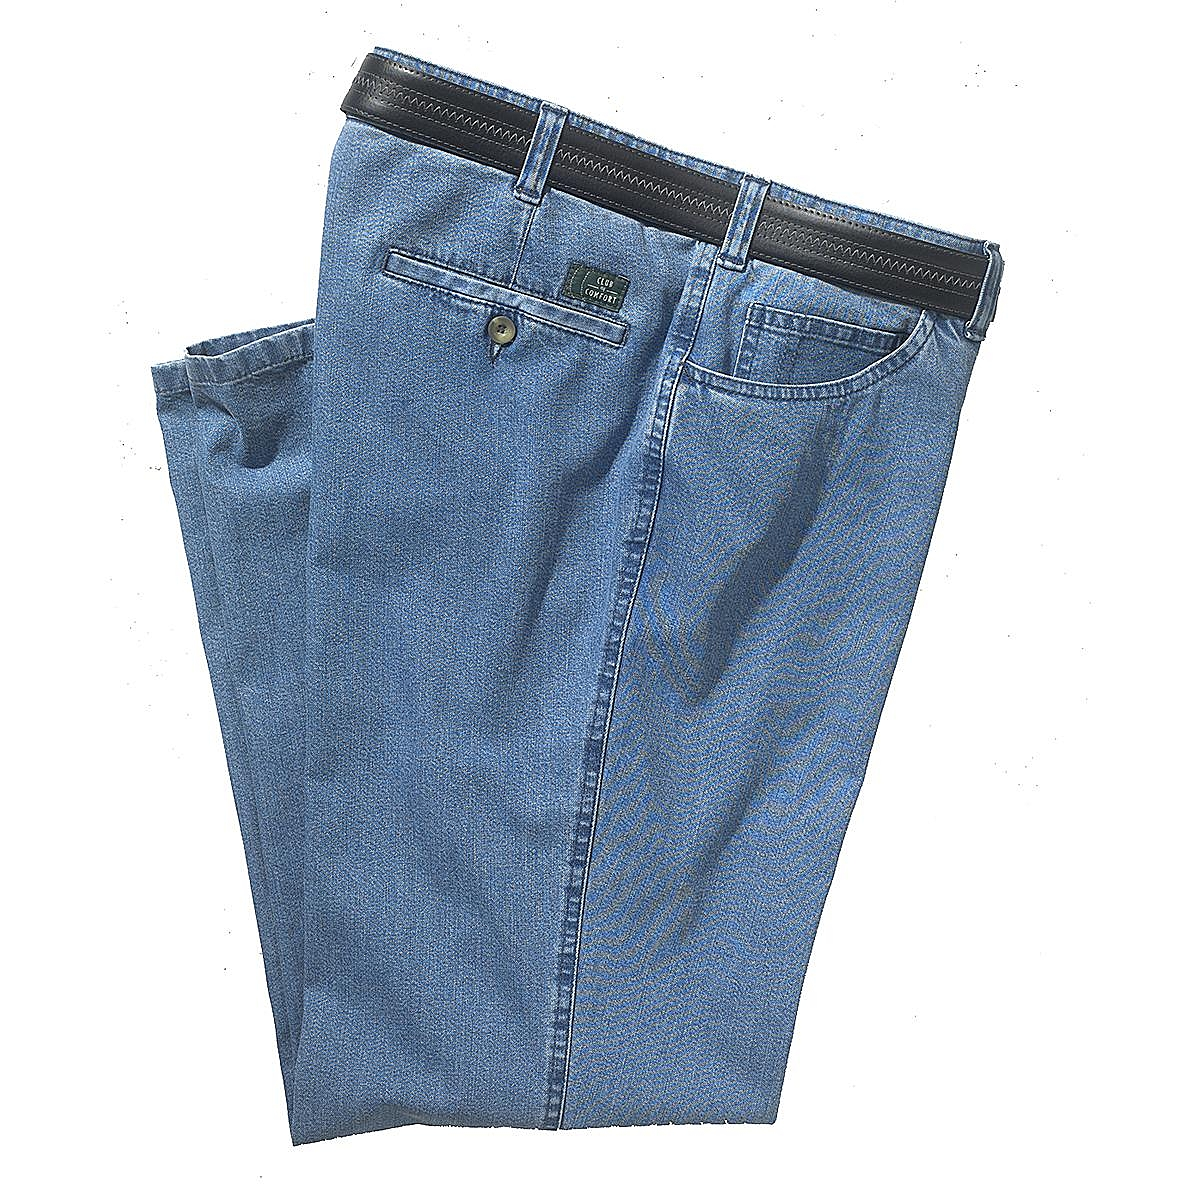 club of comfort jeans nano care fleckschutz bleach gr enspezialist m nnermode. Black Bedroom Furniture Sets. Home Design Ideas